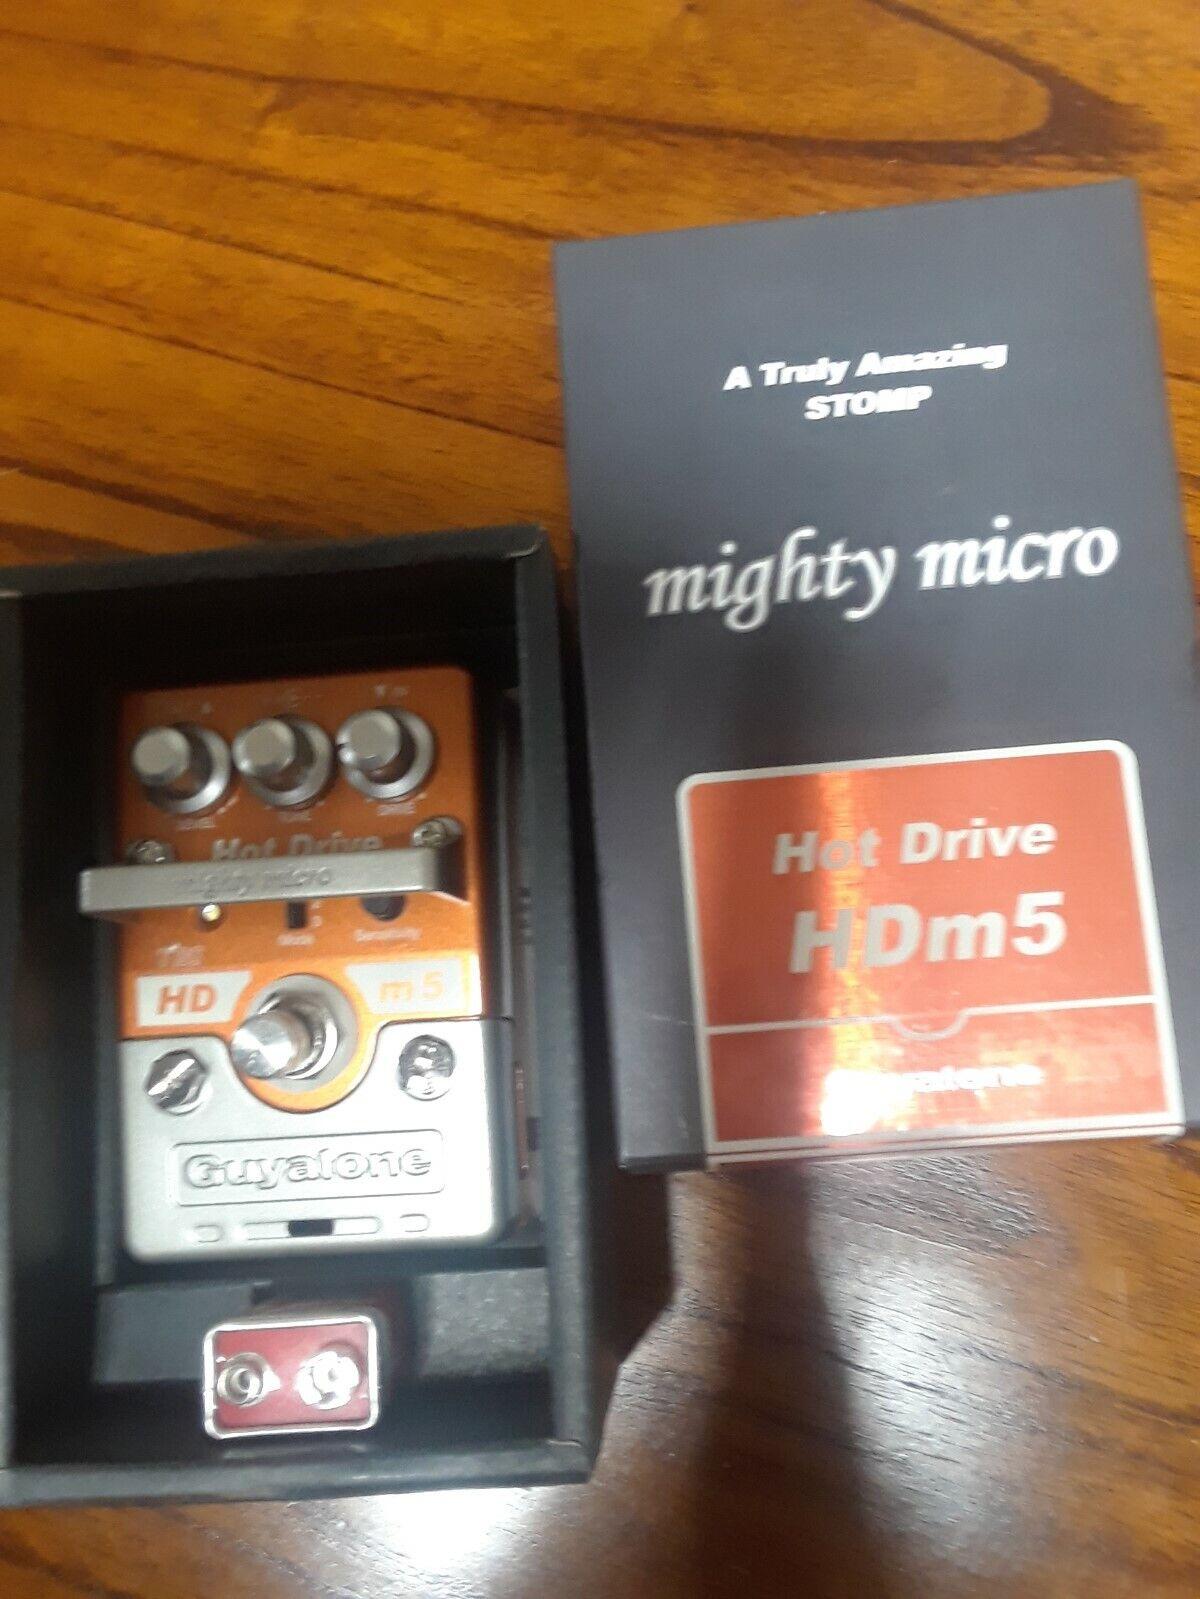 Guyatone HDm5 Mighty Micro Hot Drive Overdrive Guitar Effect Pedal MIJ Japan